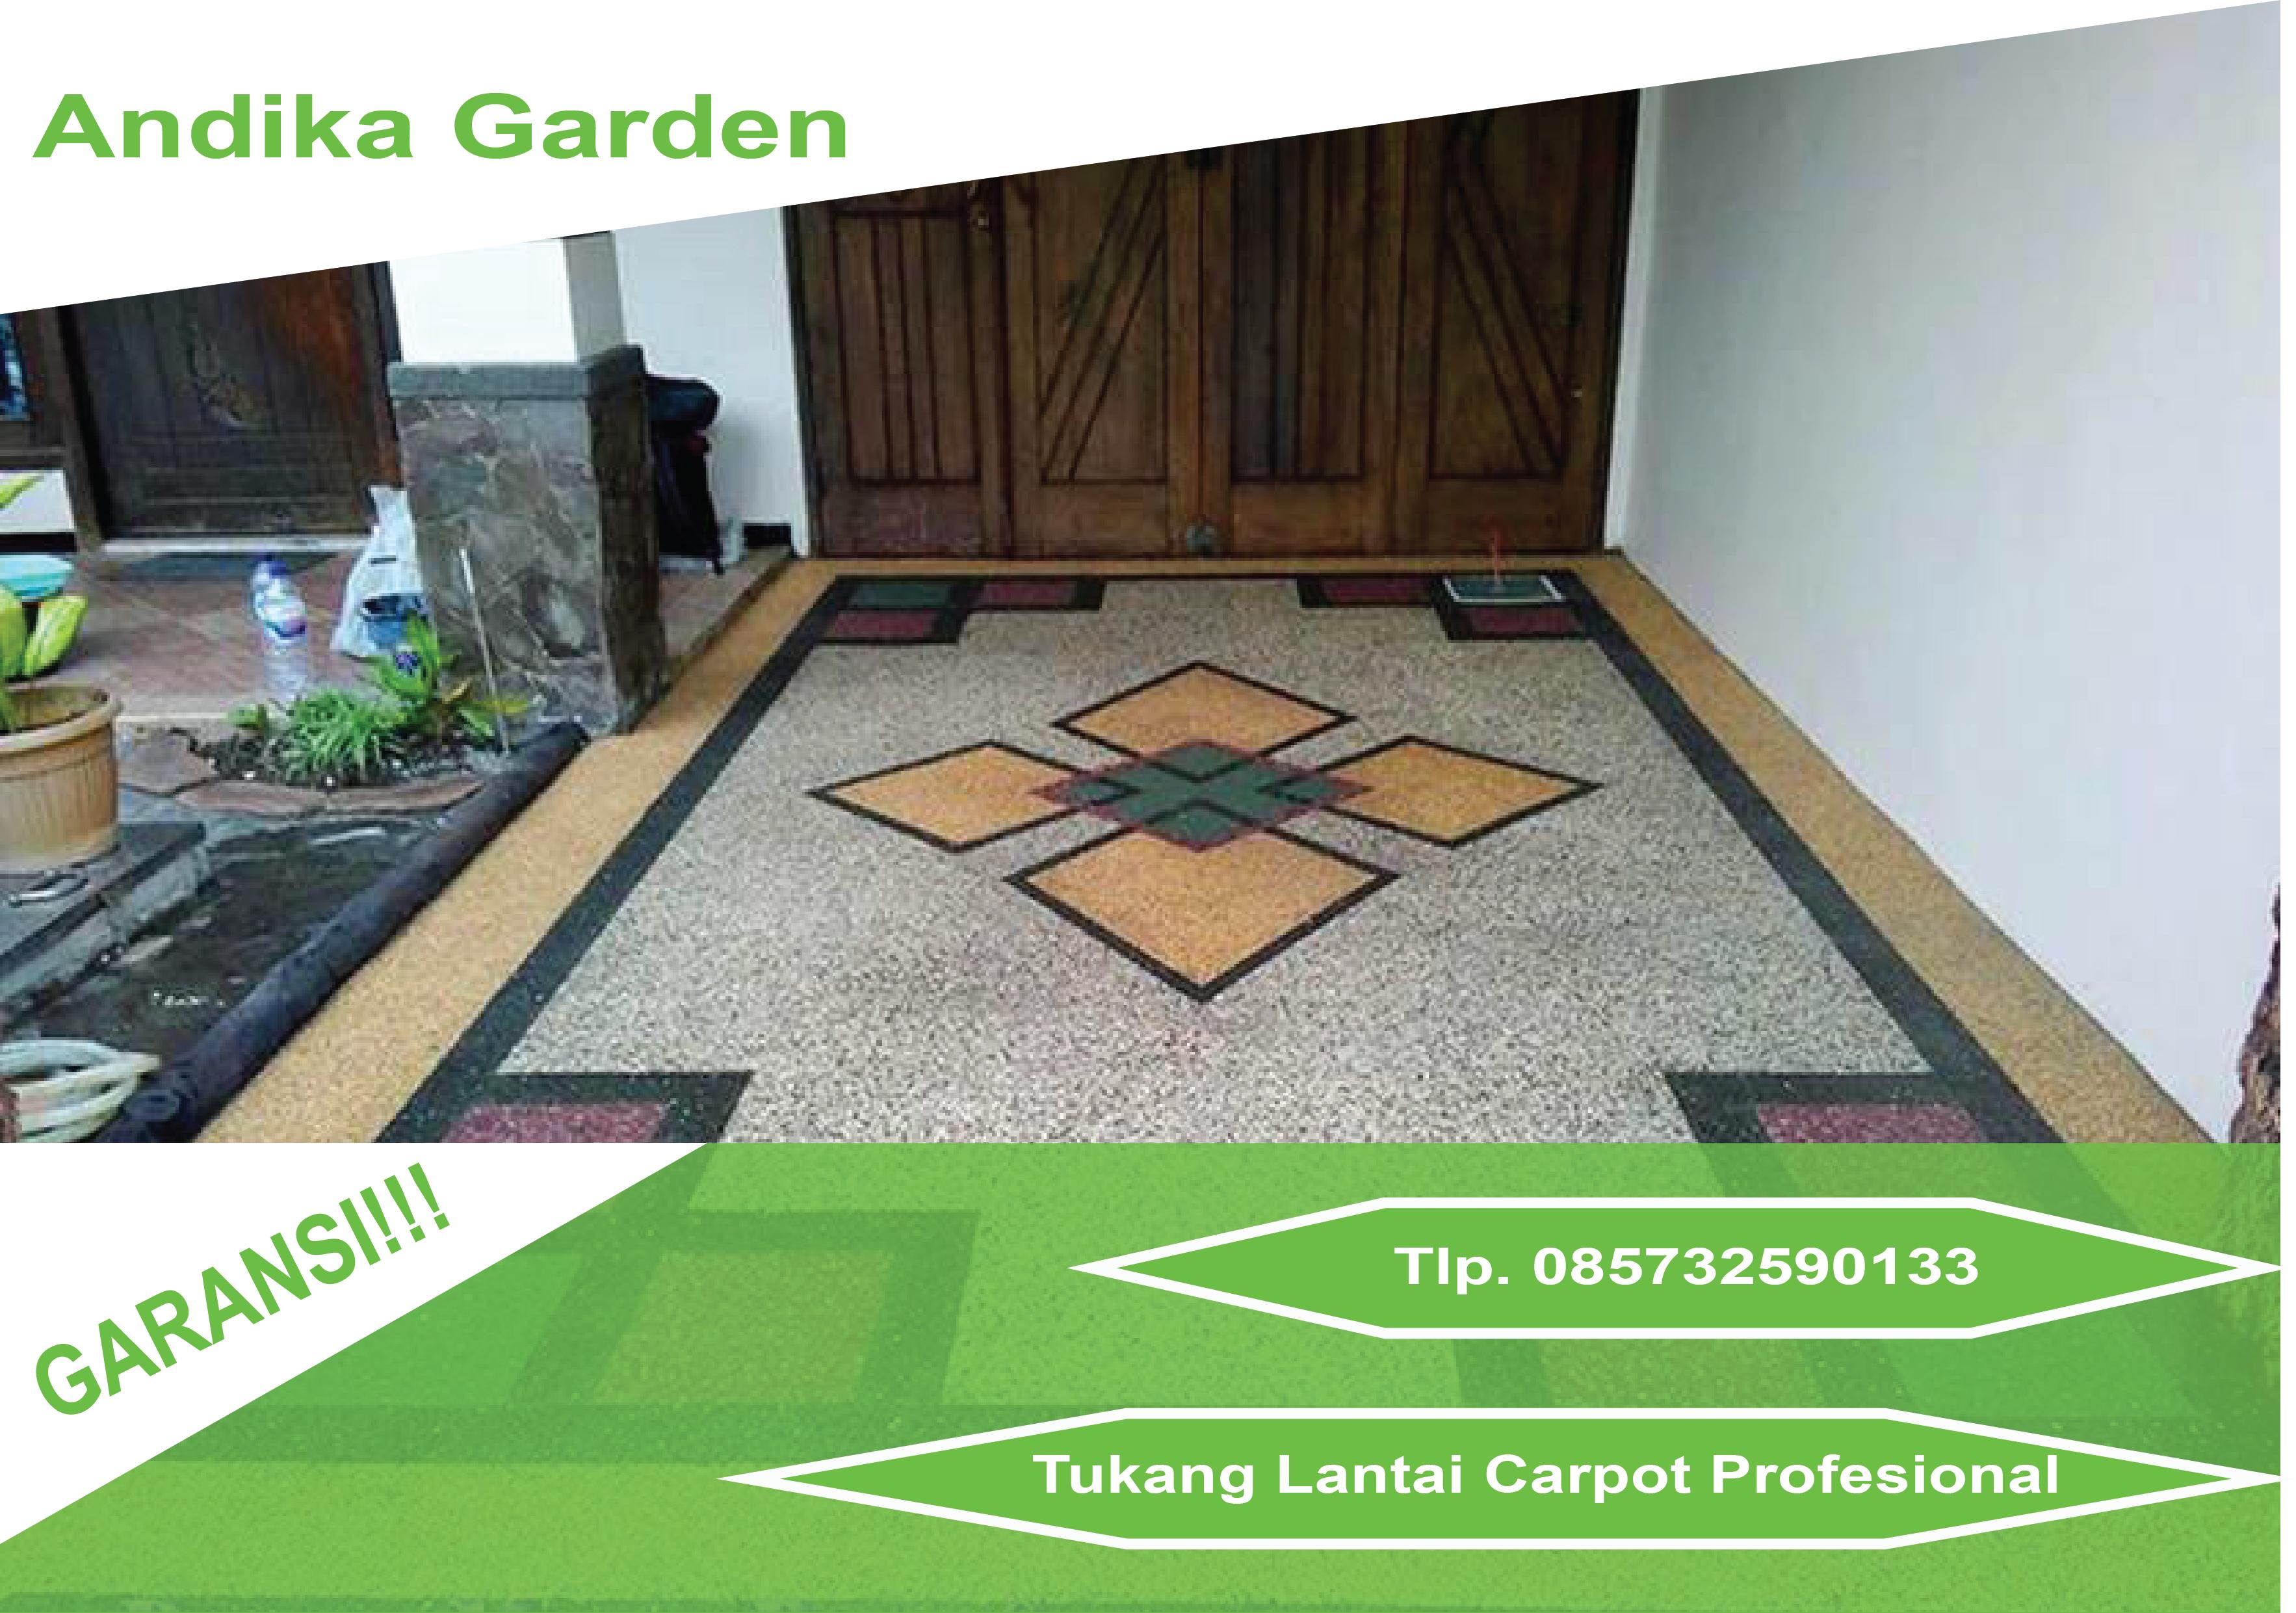 Jual Lantai Carport Terpasang Tlp 0857 3259 0133 Andika Garden In 2020 Carport Batu Installation